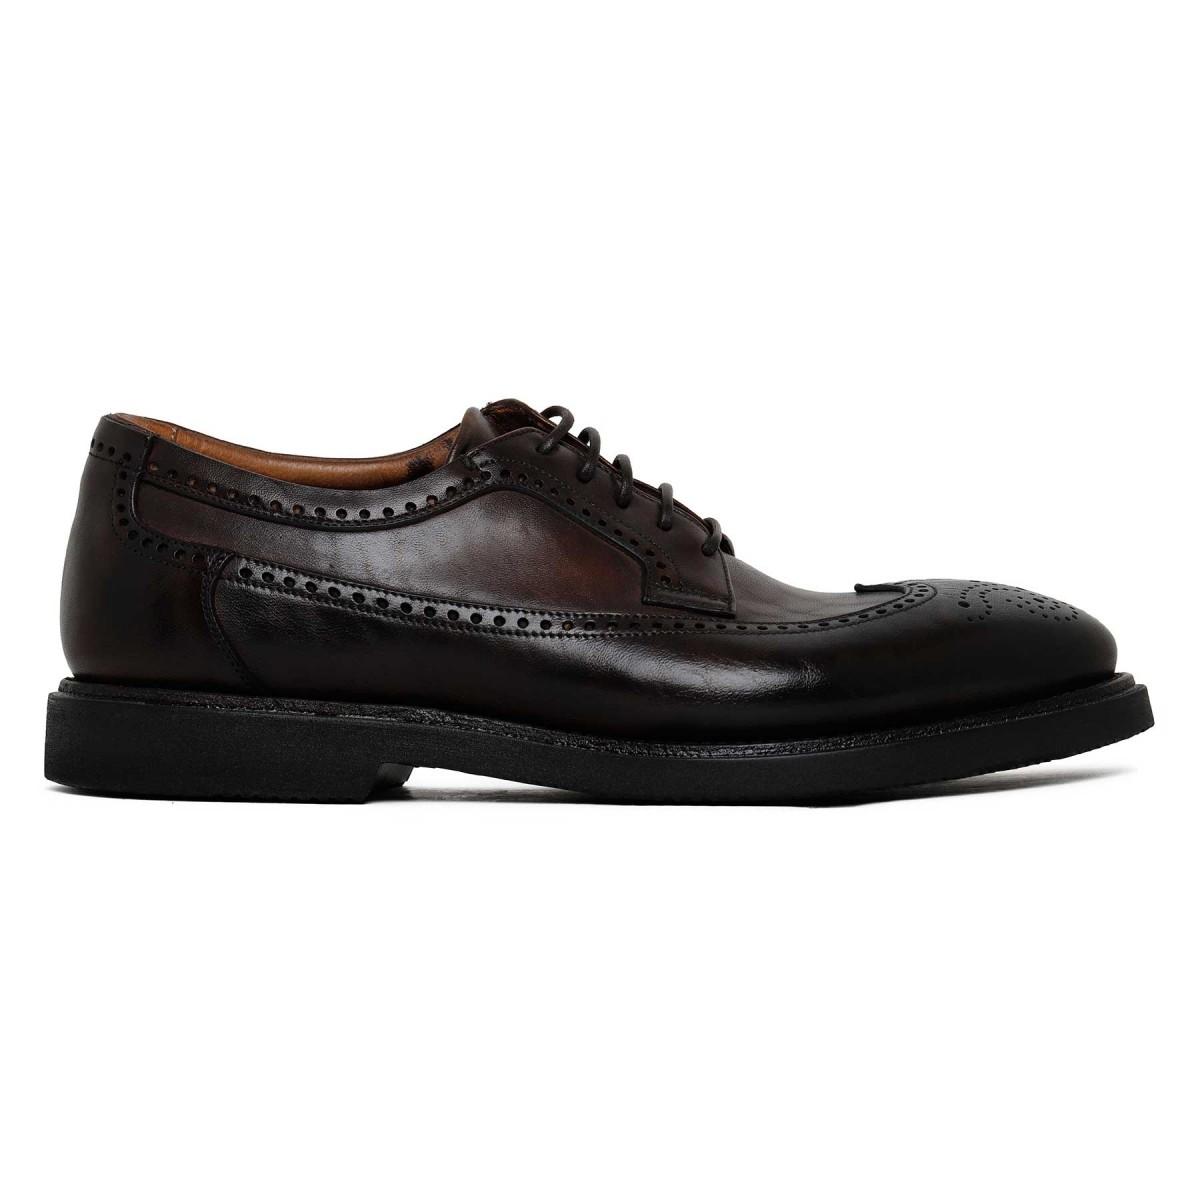 Dark brown leather Derby shoes